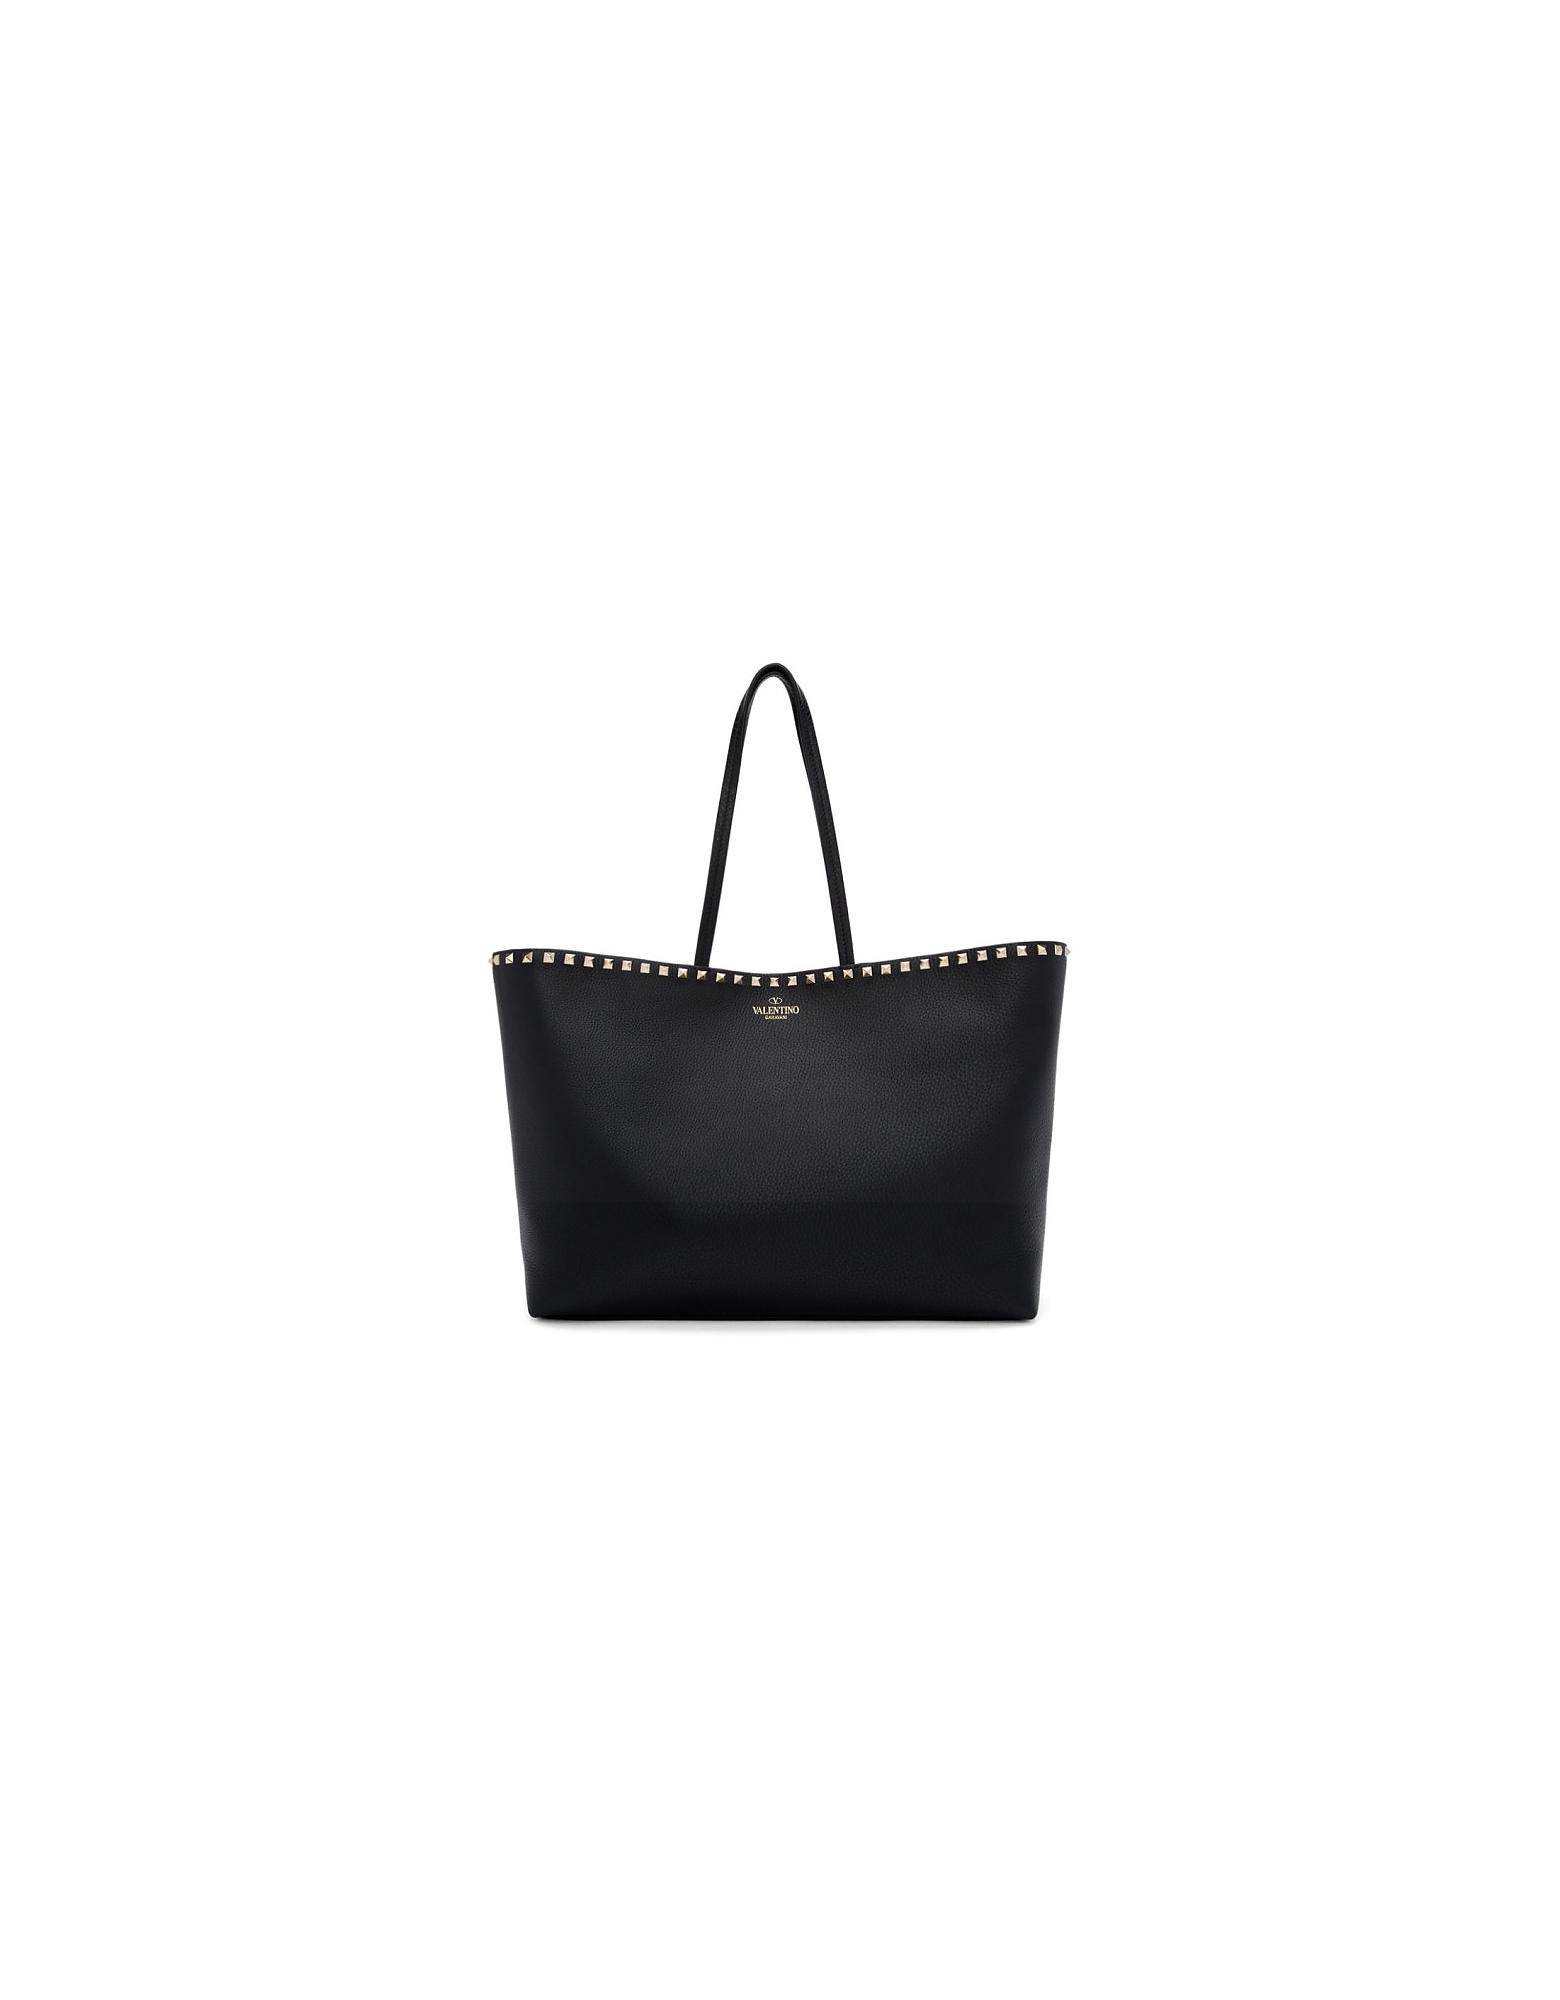 Valentino Designer Handbags, Black Valentino Garavani Rockstud Shopper Tote